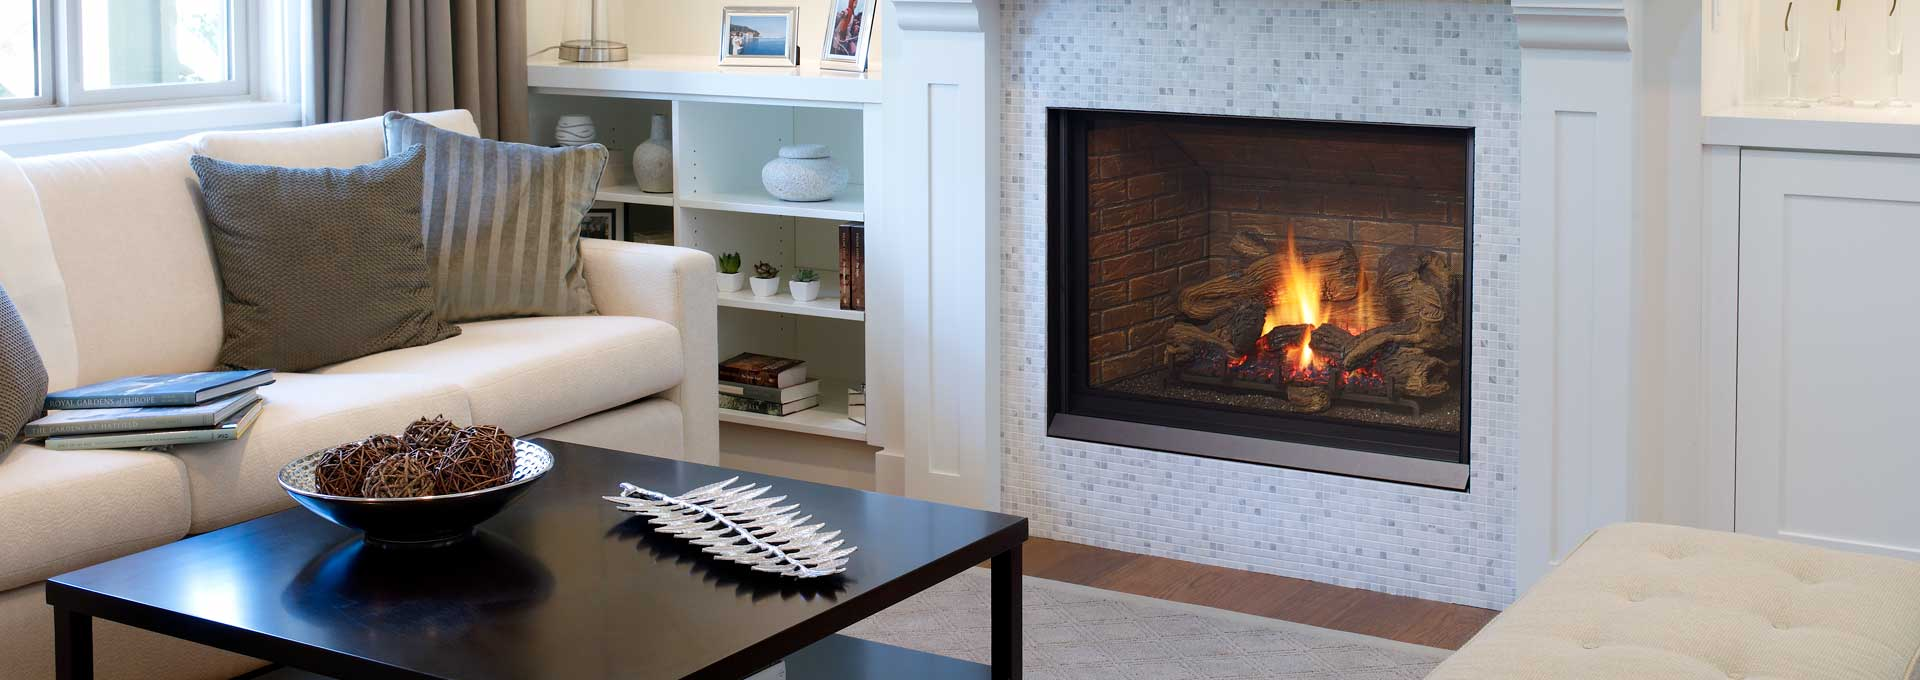 Bellavista B41XTCE Gas Fireplace-1